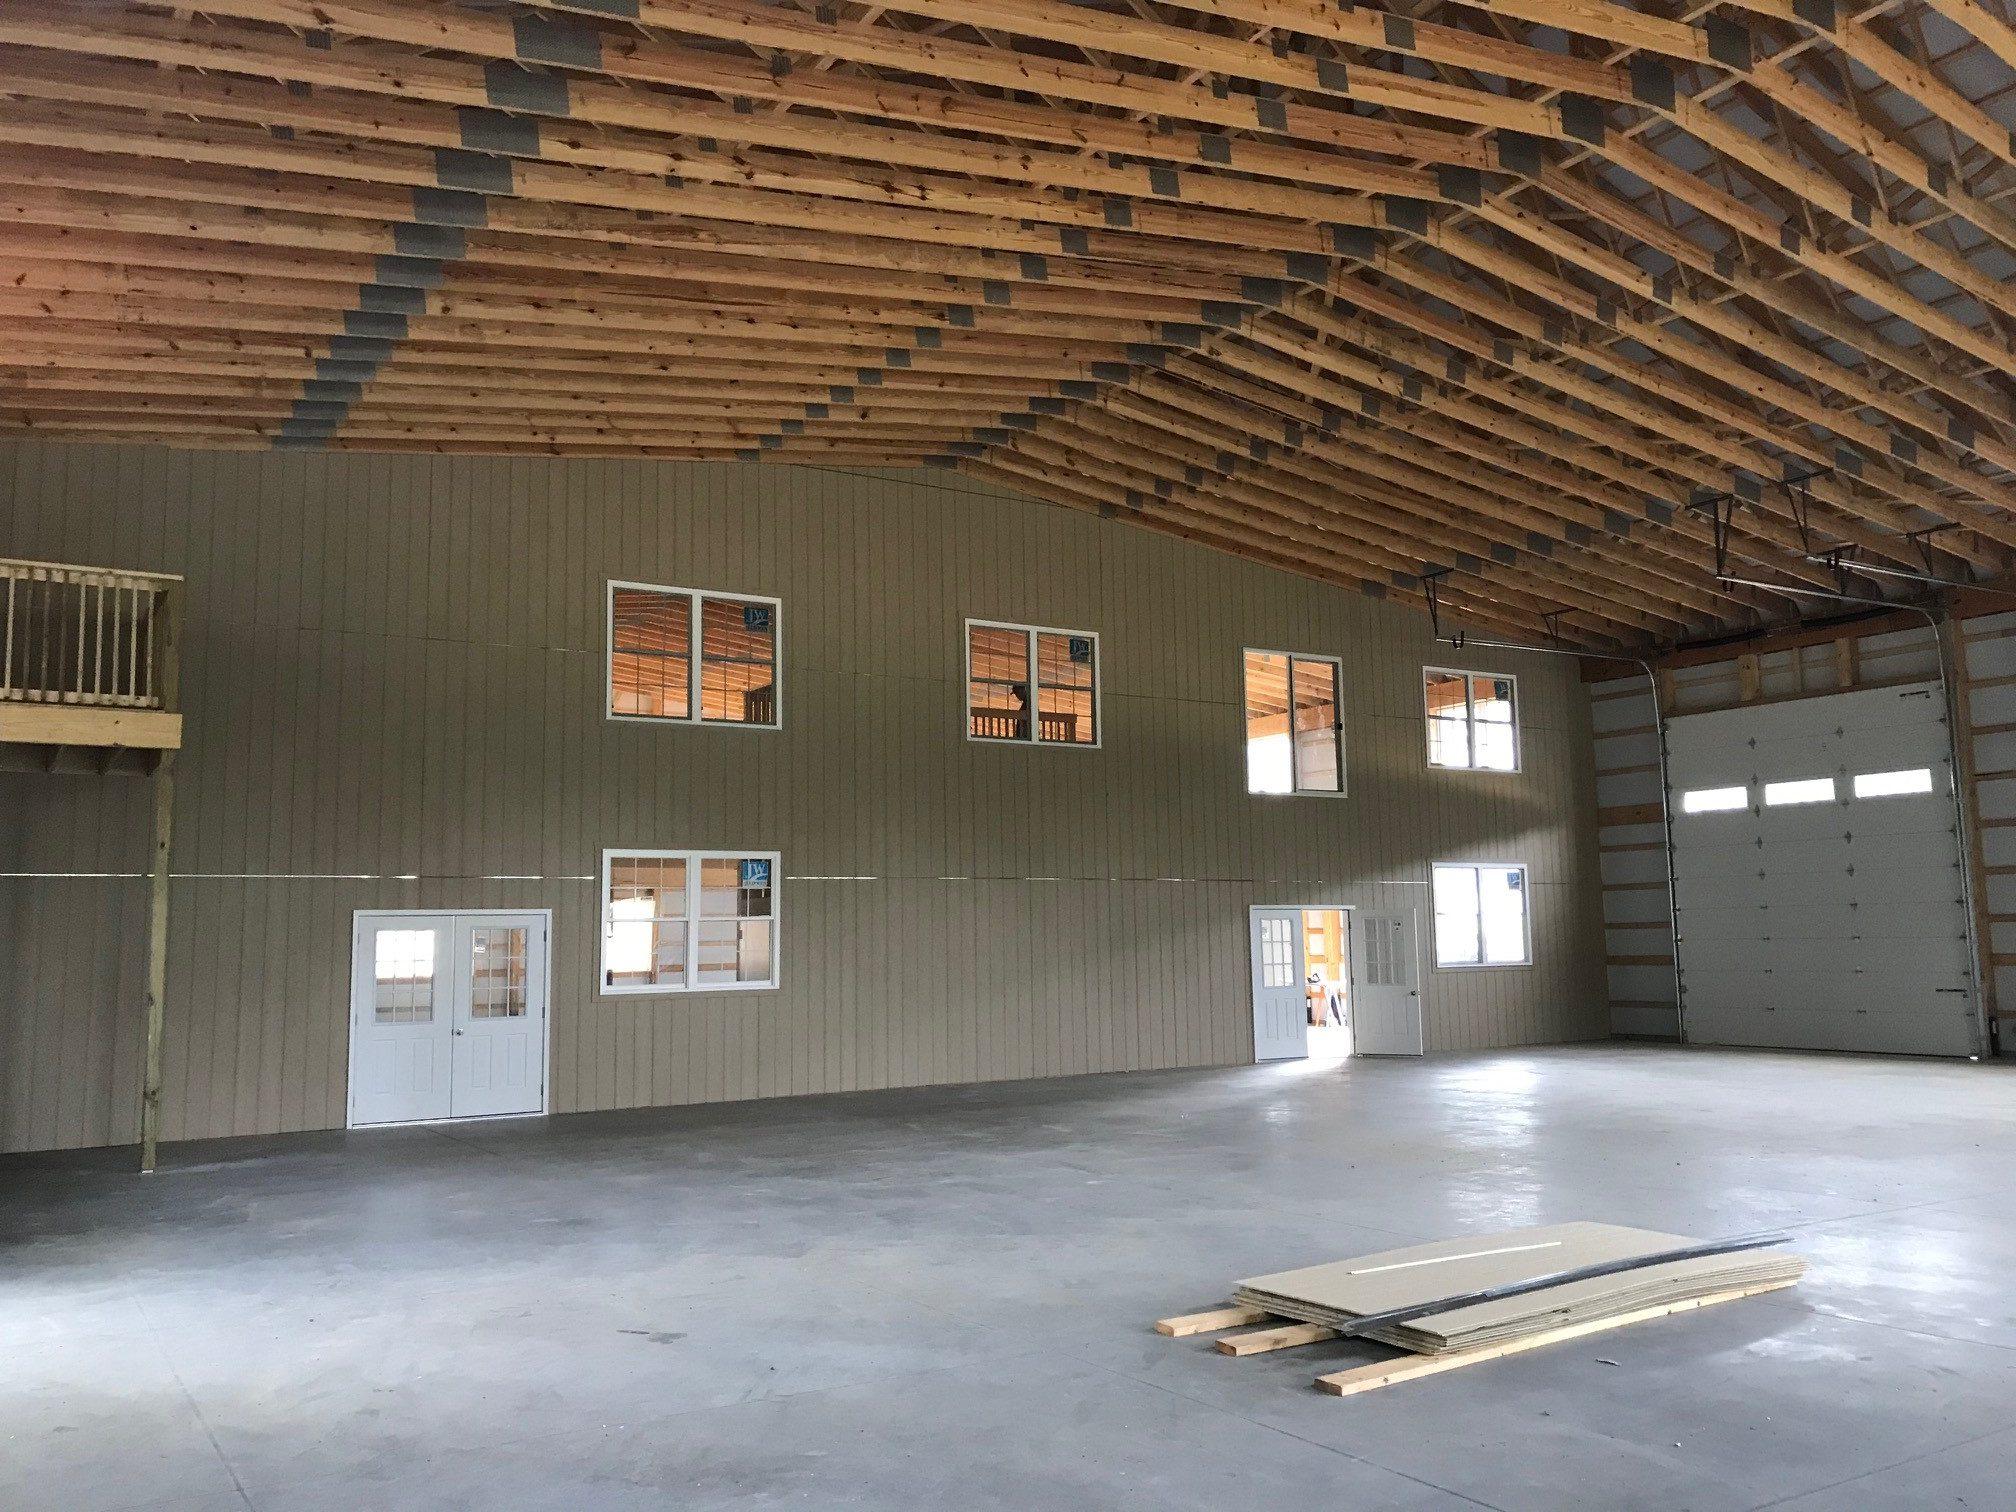 interior of newly construction pole barn